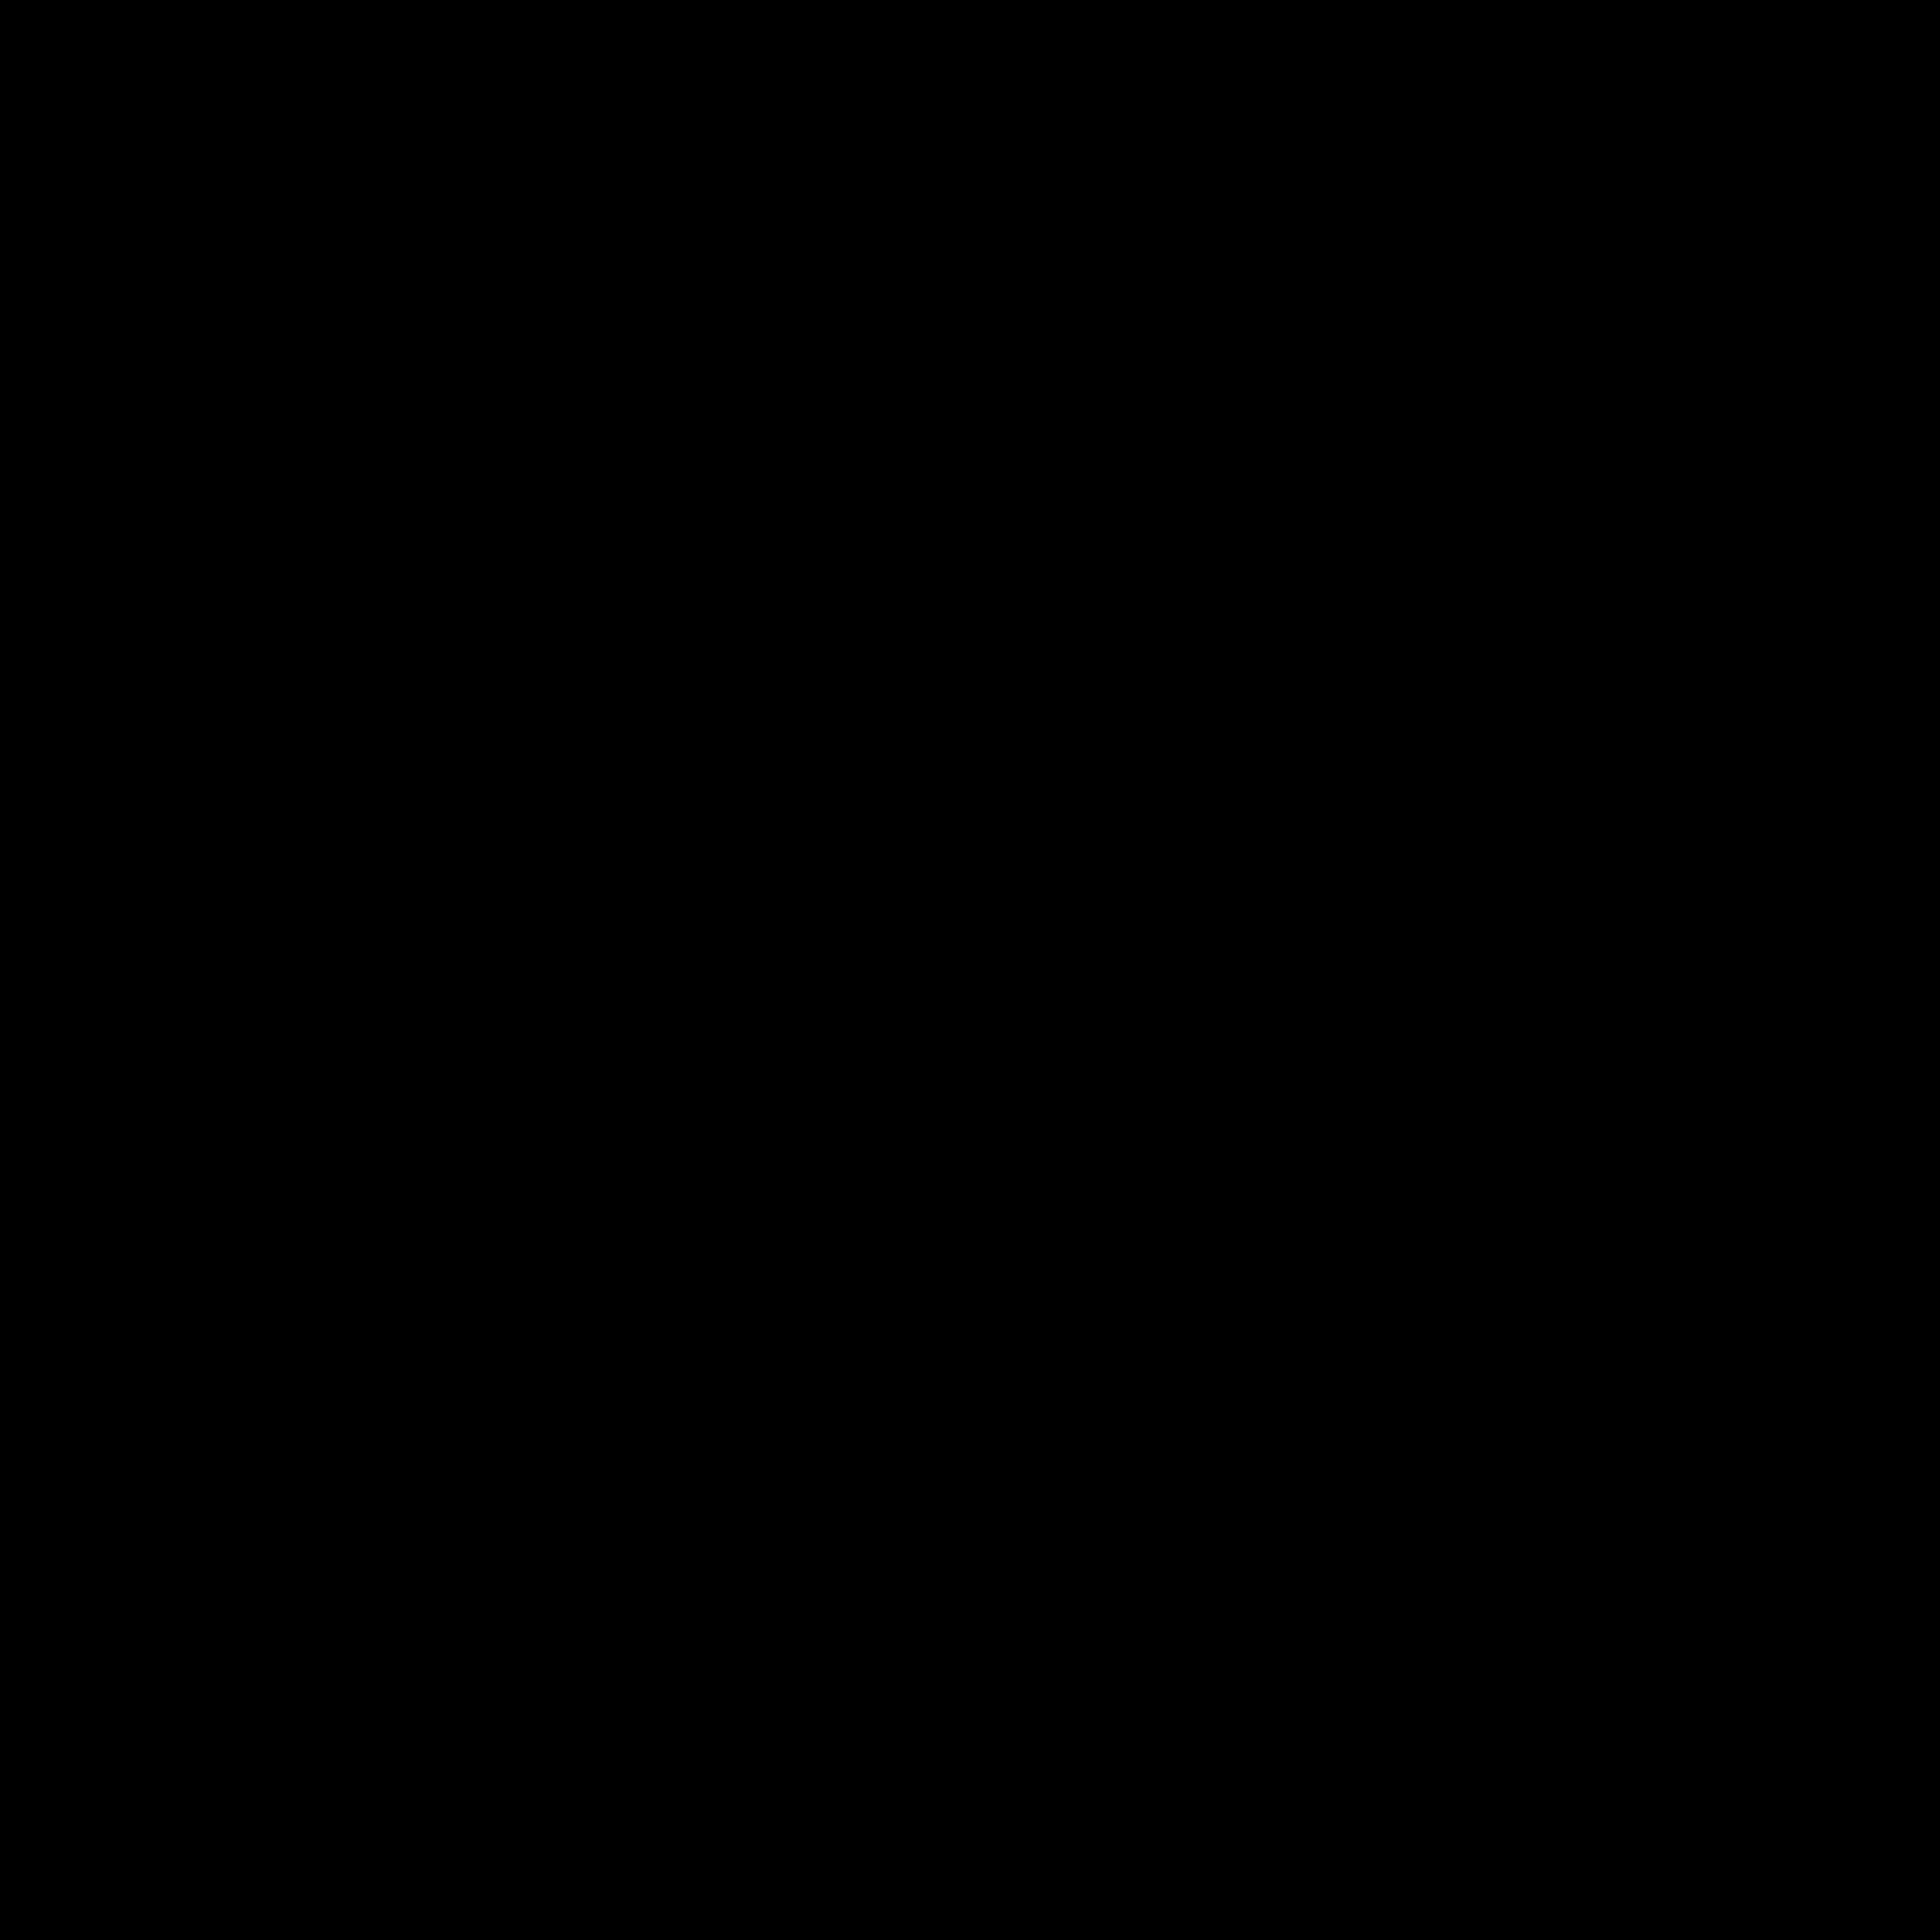 Open PlusPng.com  - Motorola PNG